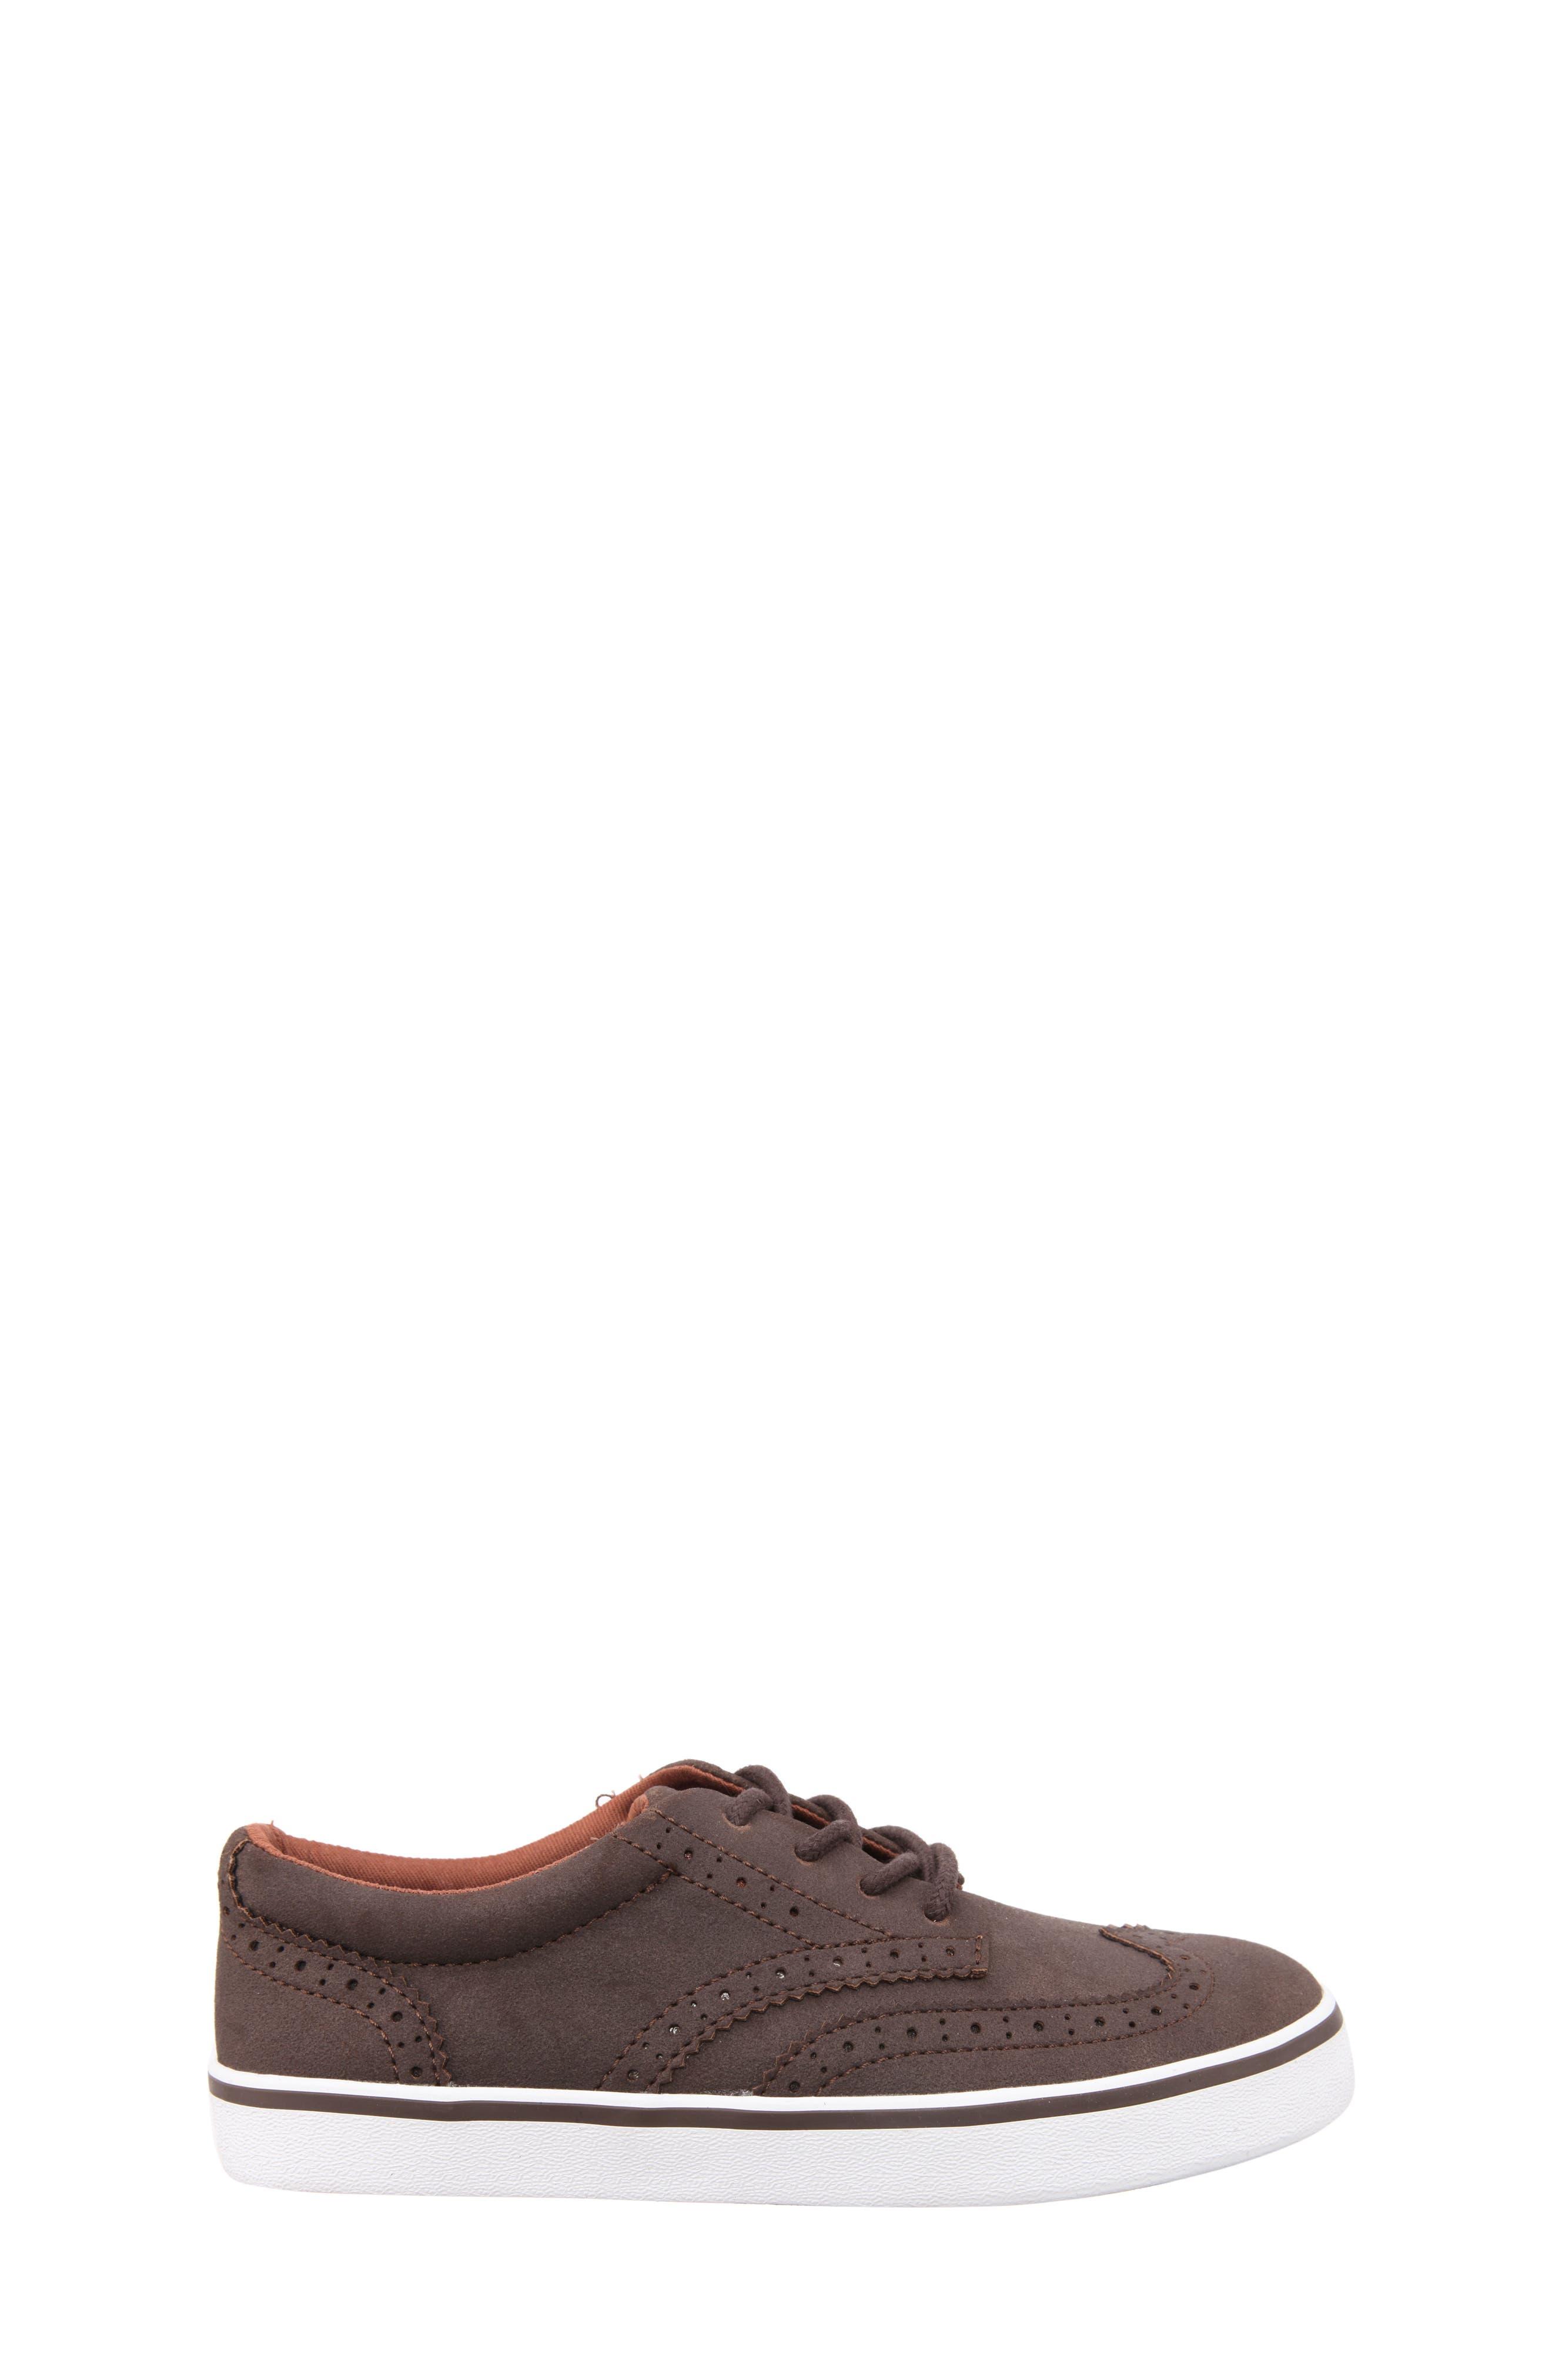 Wingtip Sneaker,                             Alternate thumbnail 8, color,